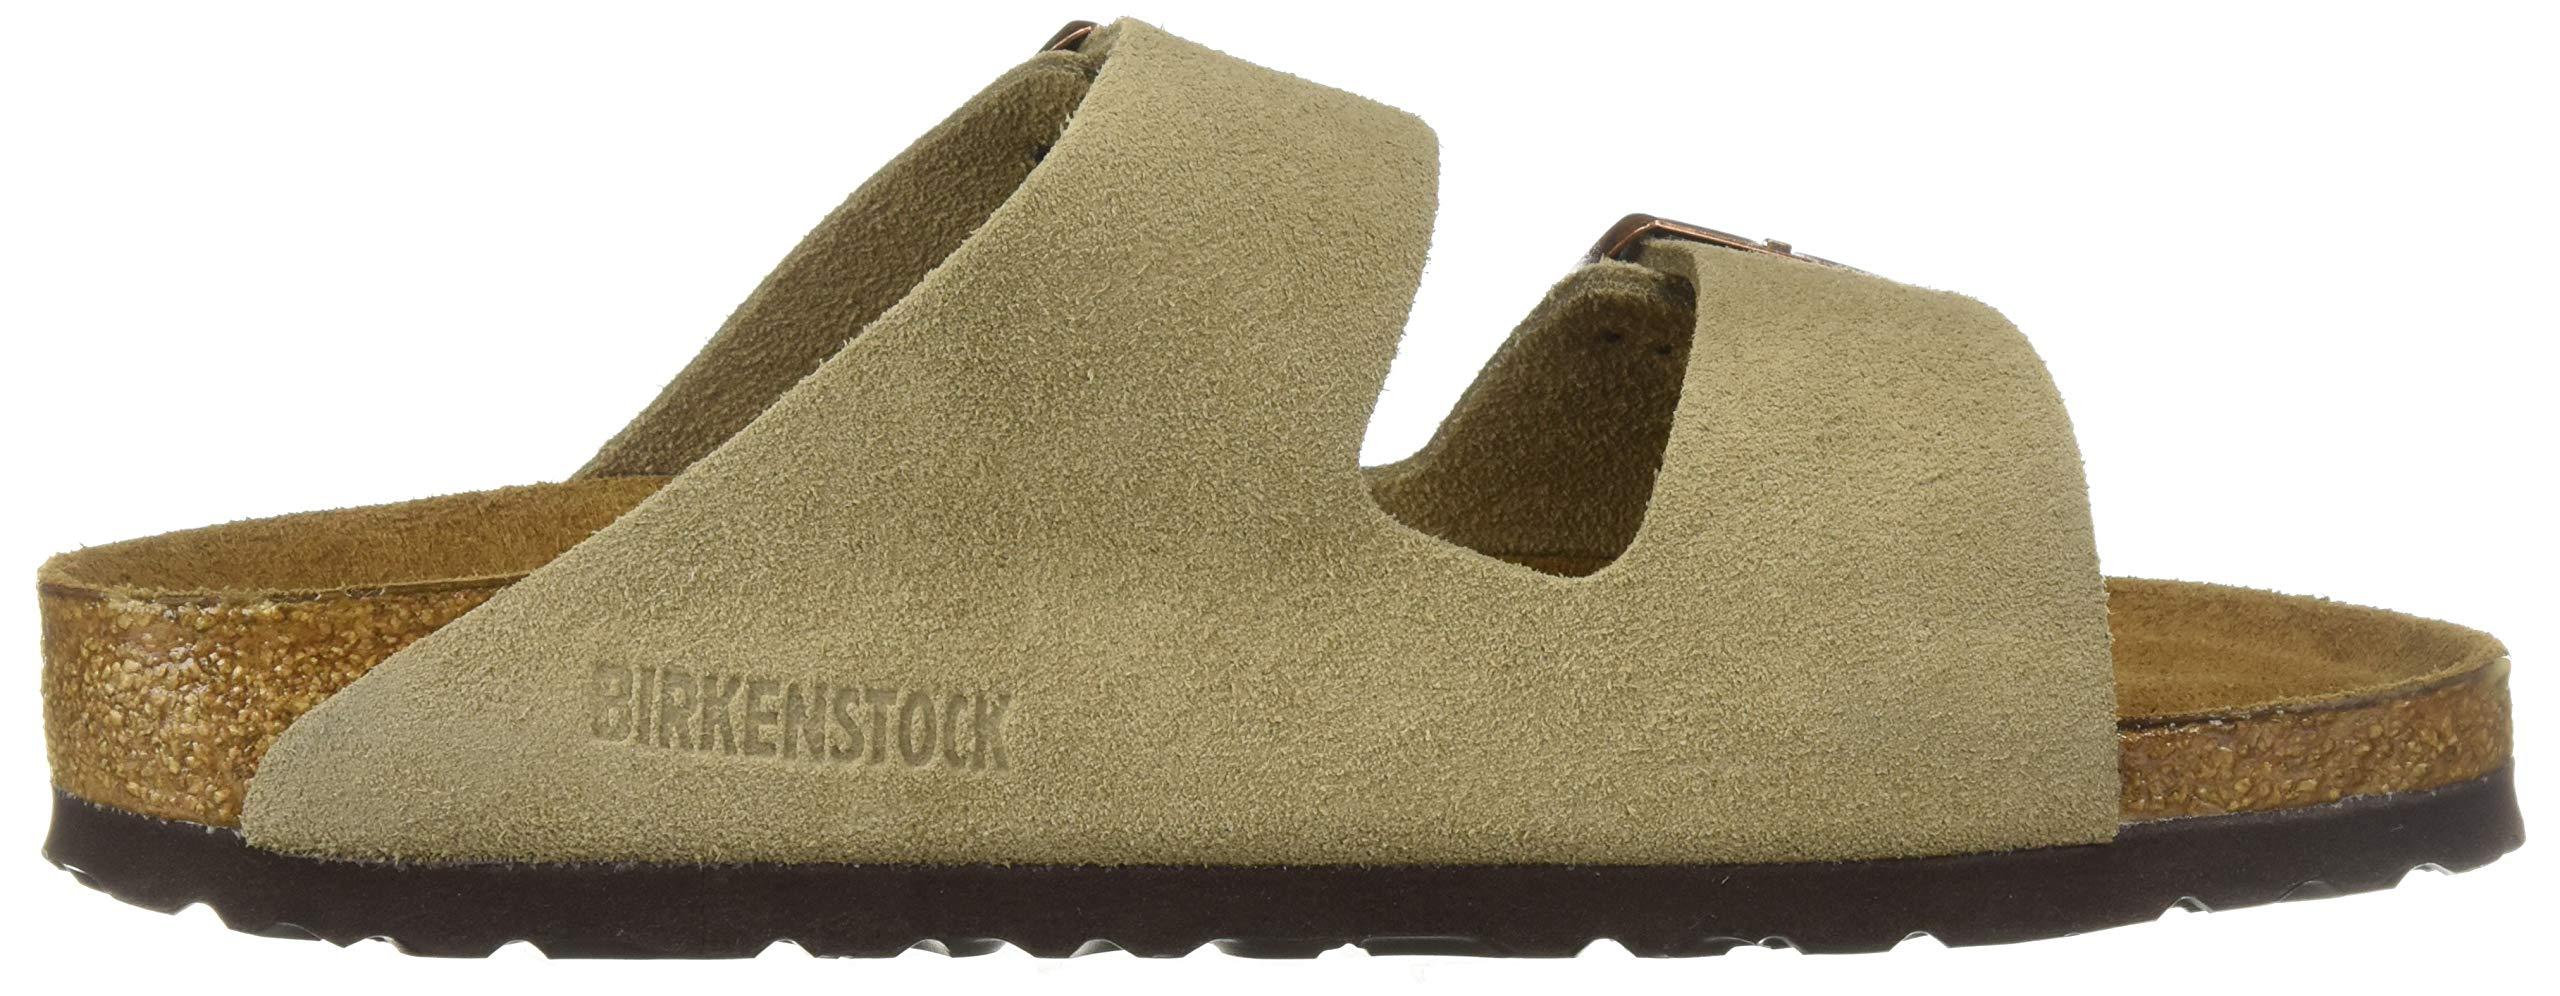 Birkenstock Arizona Soft Footbed Taupe Suede Regular Width - EU Size 35 / Women's US Sizes 4-4.5 by Birkenstock (Image #7)